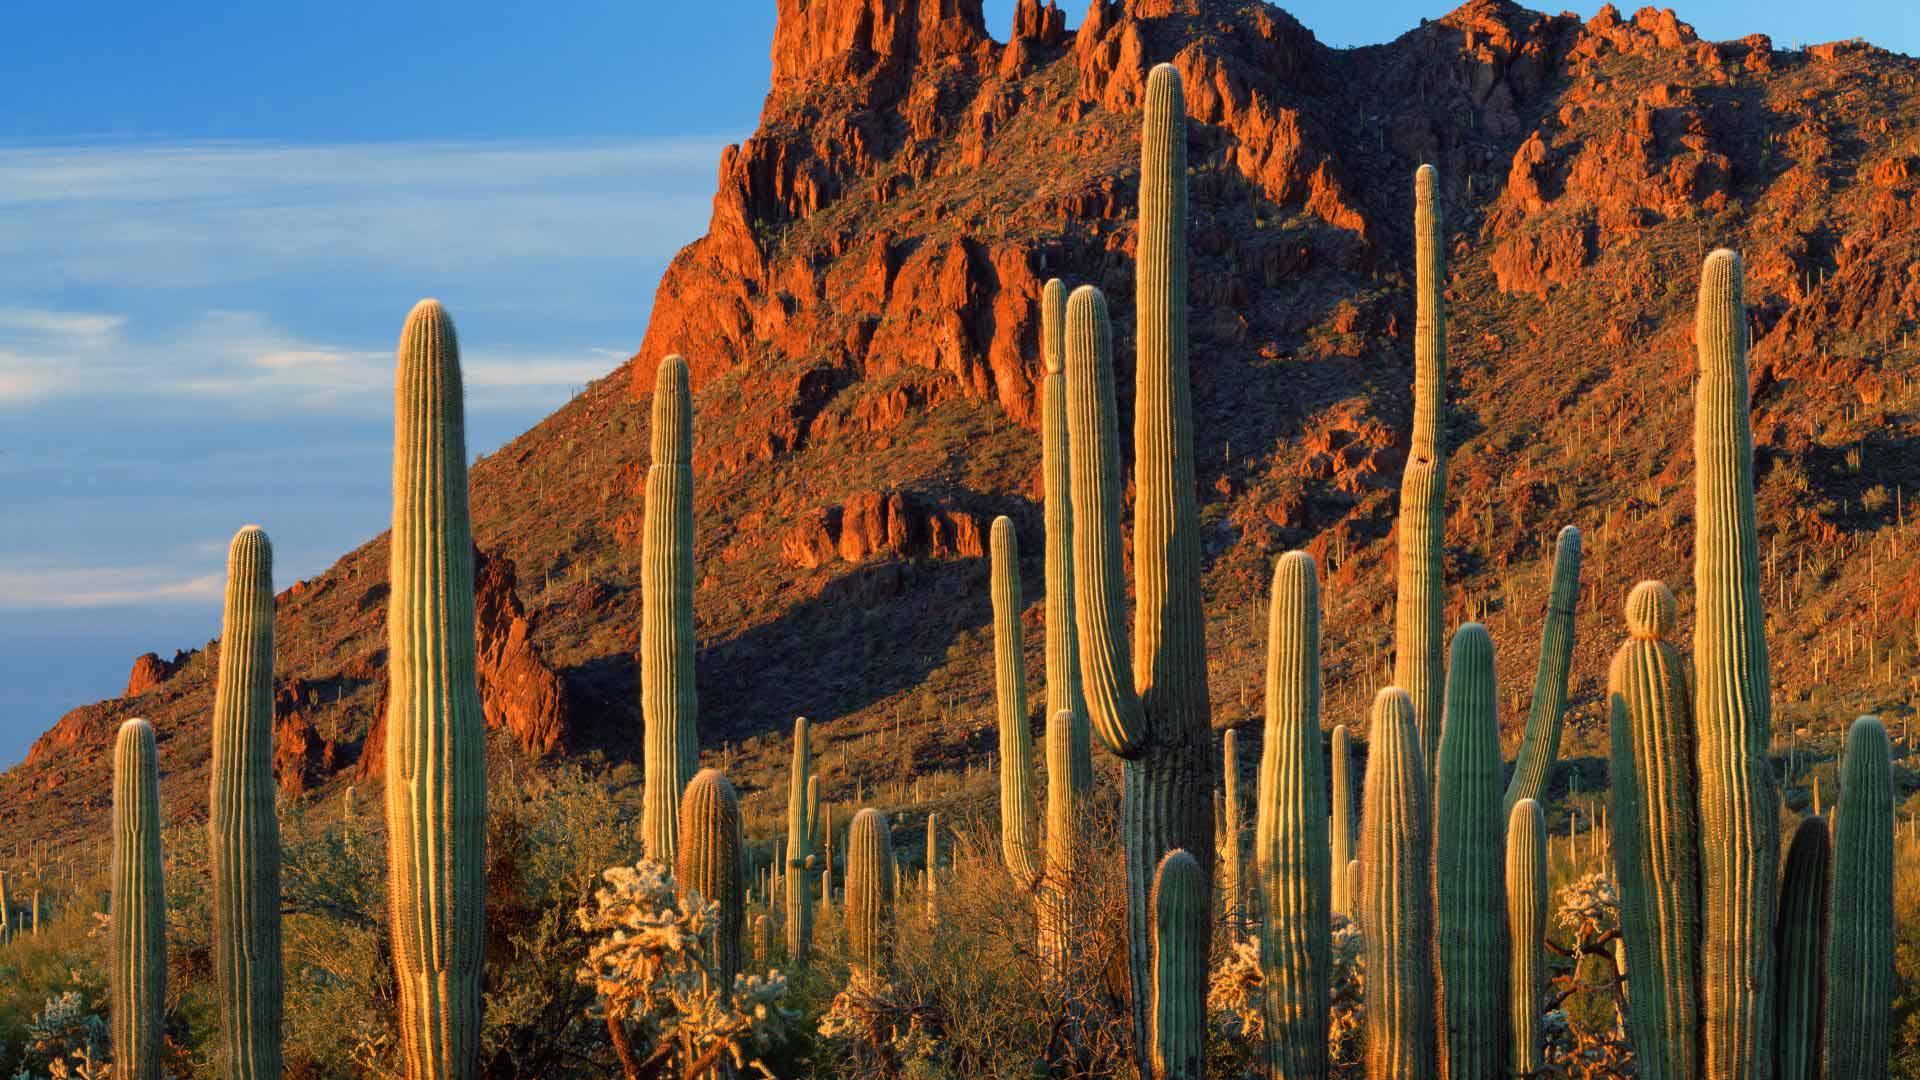 Alamo Canyon, Organ Pipe Cactus National Monument, Arizona